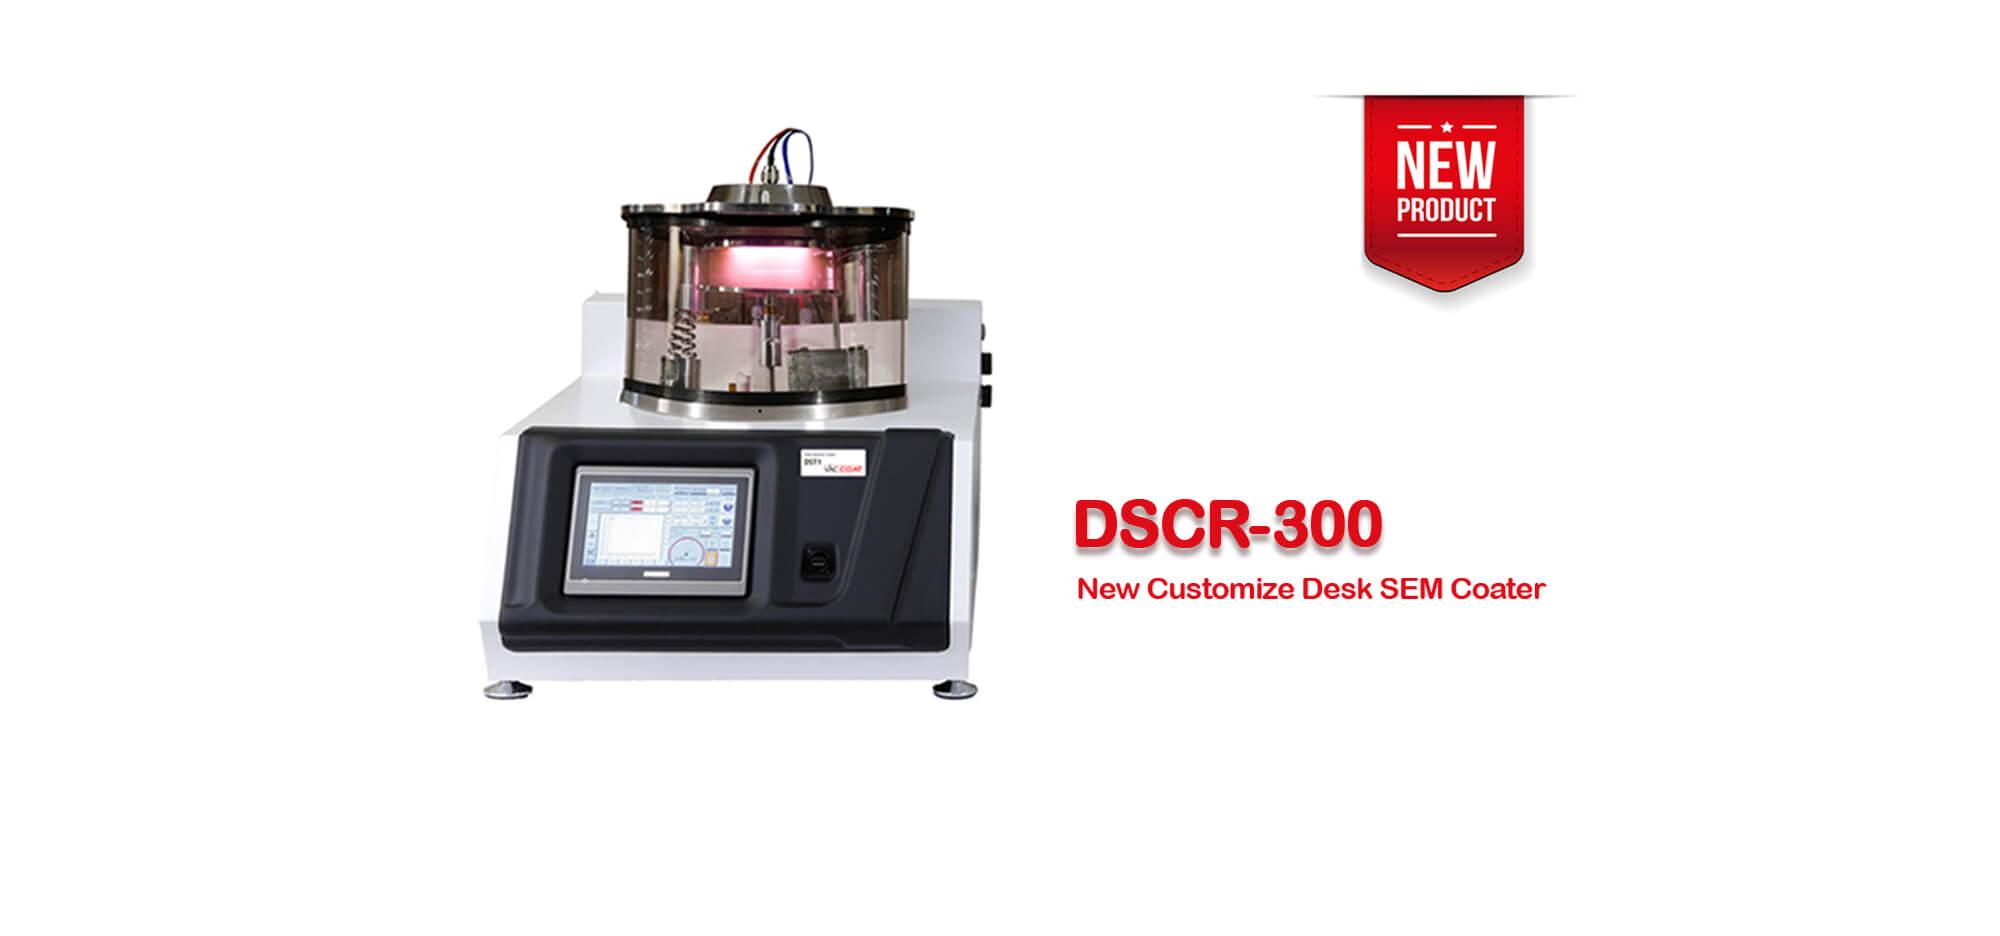 DSCR-300:New Customize Desk SEM Coater